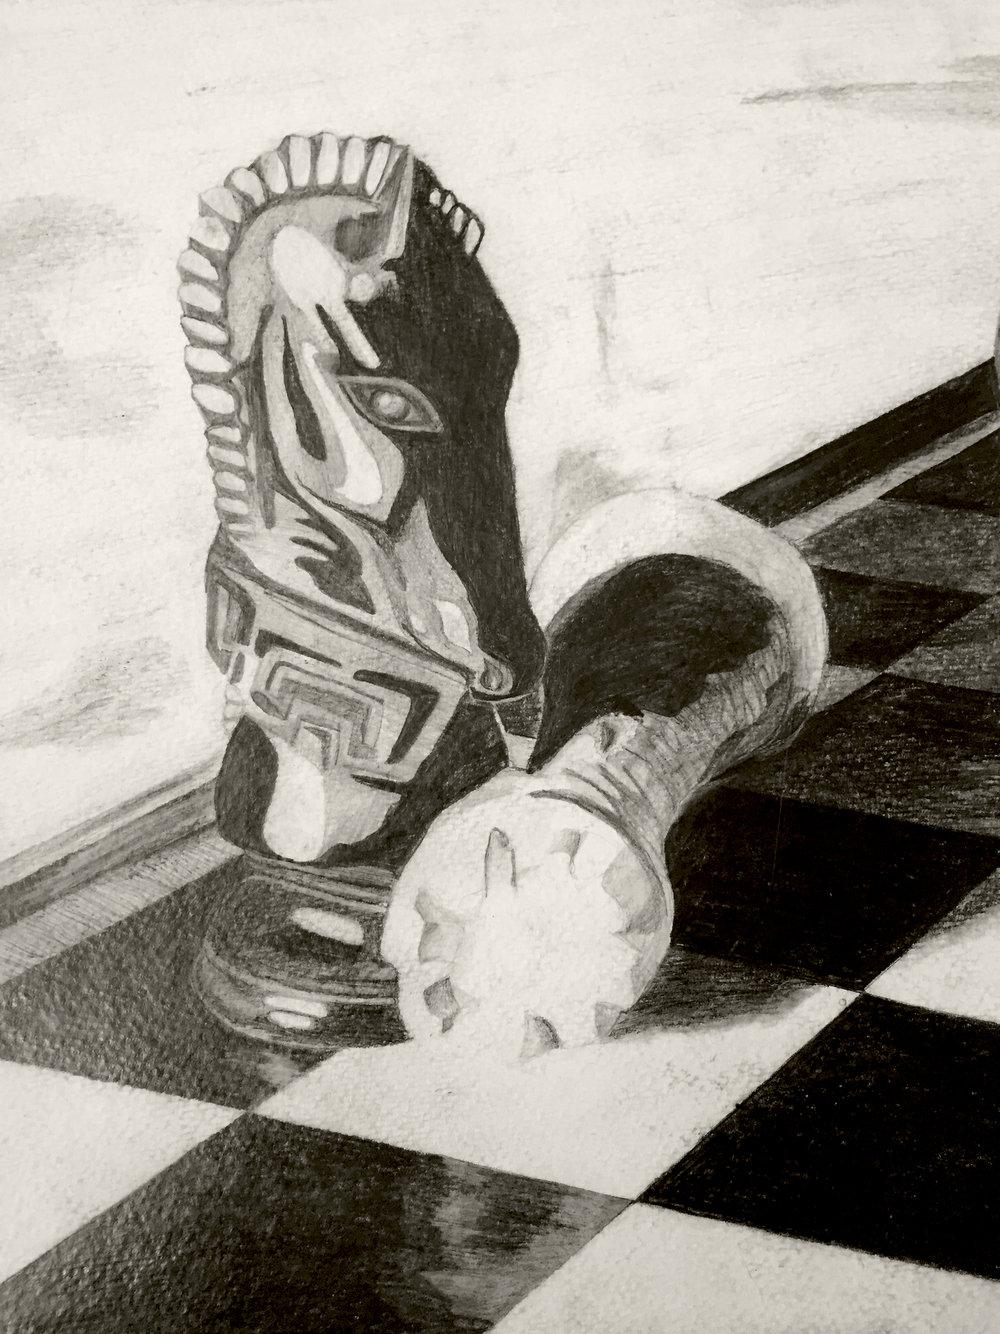 Knight study | Pencil | 2009